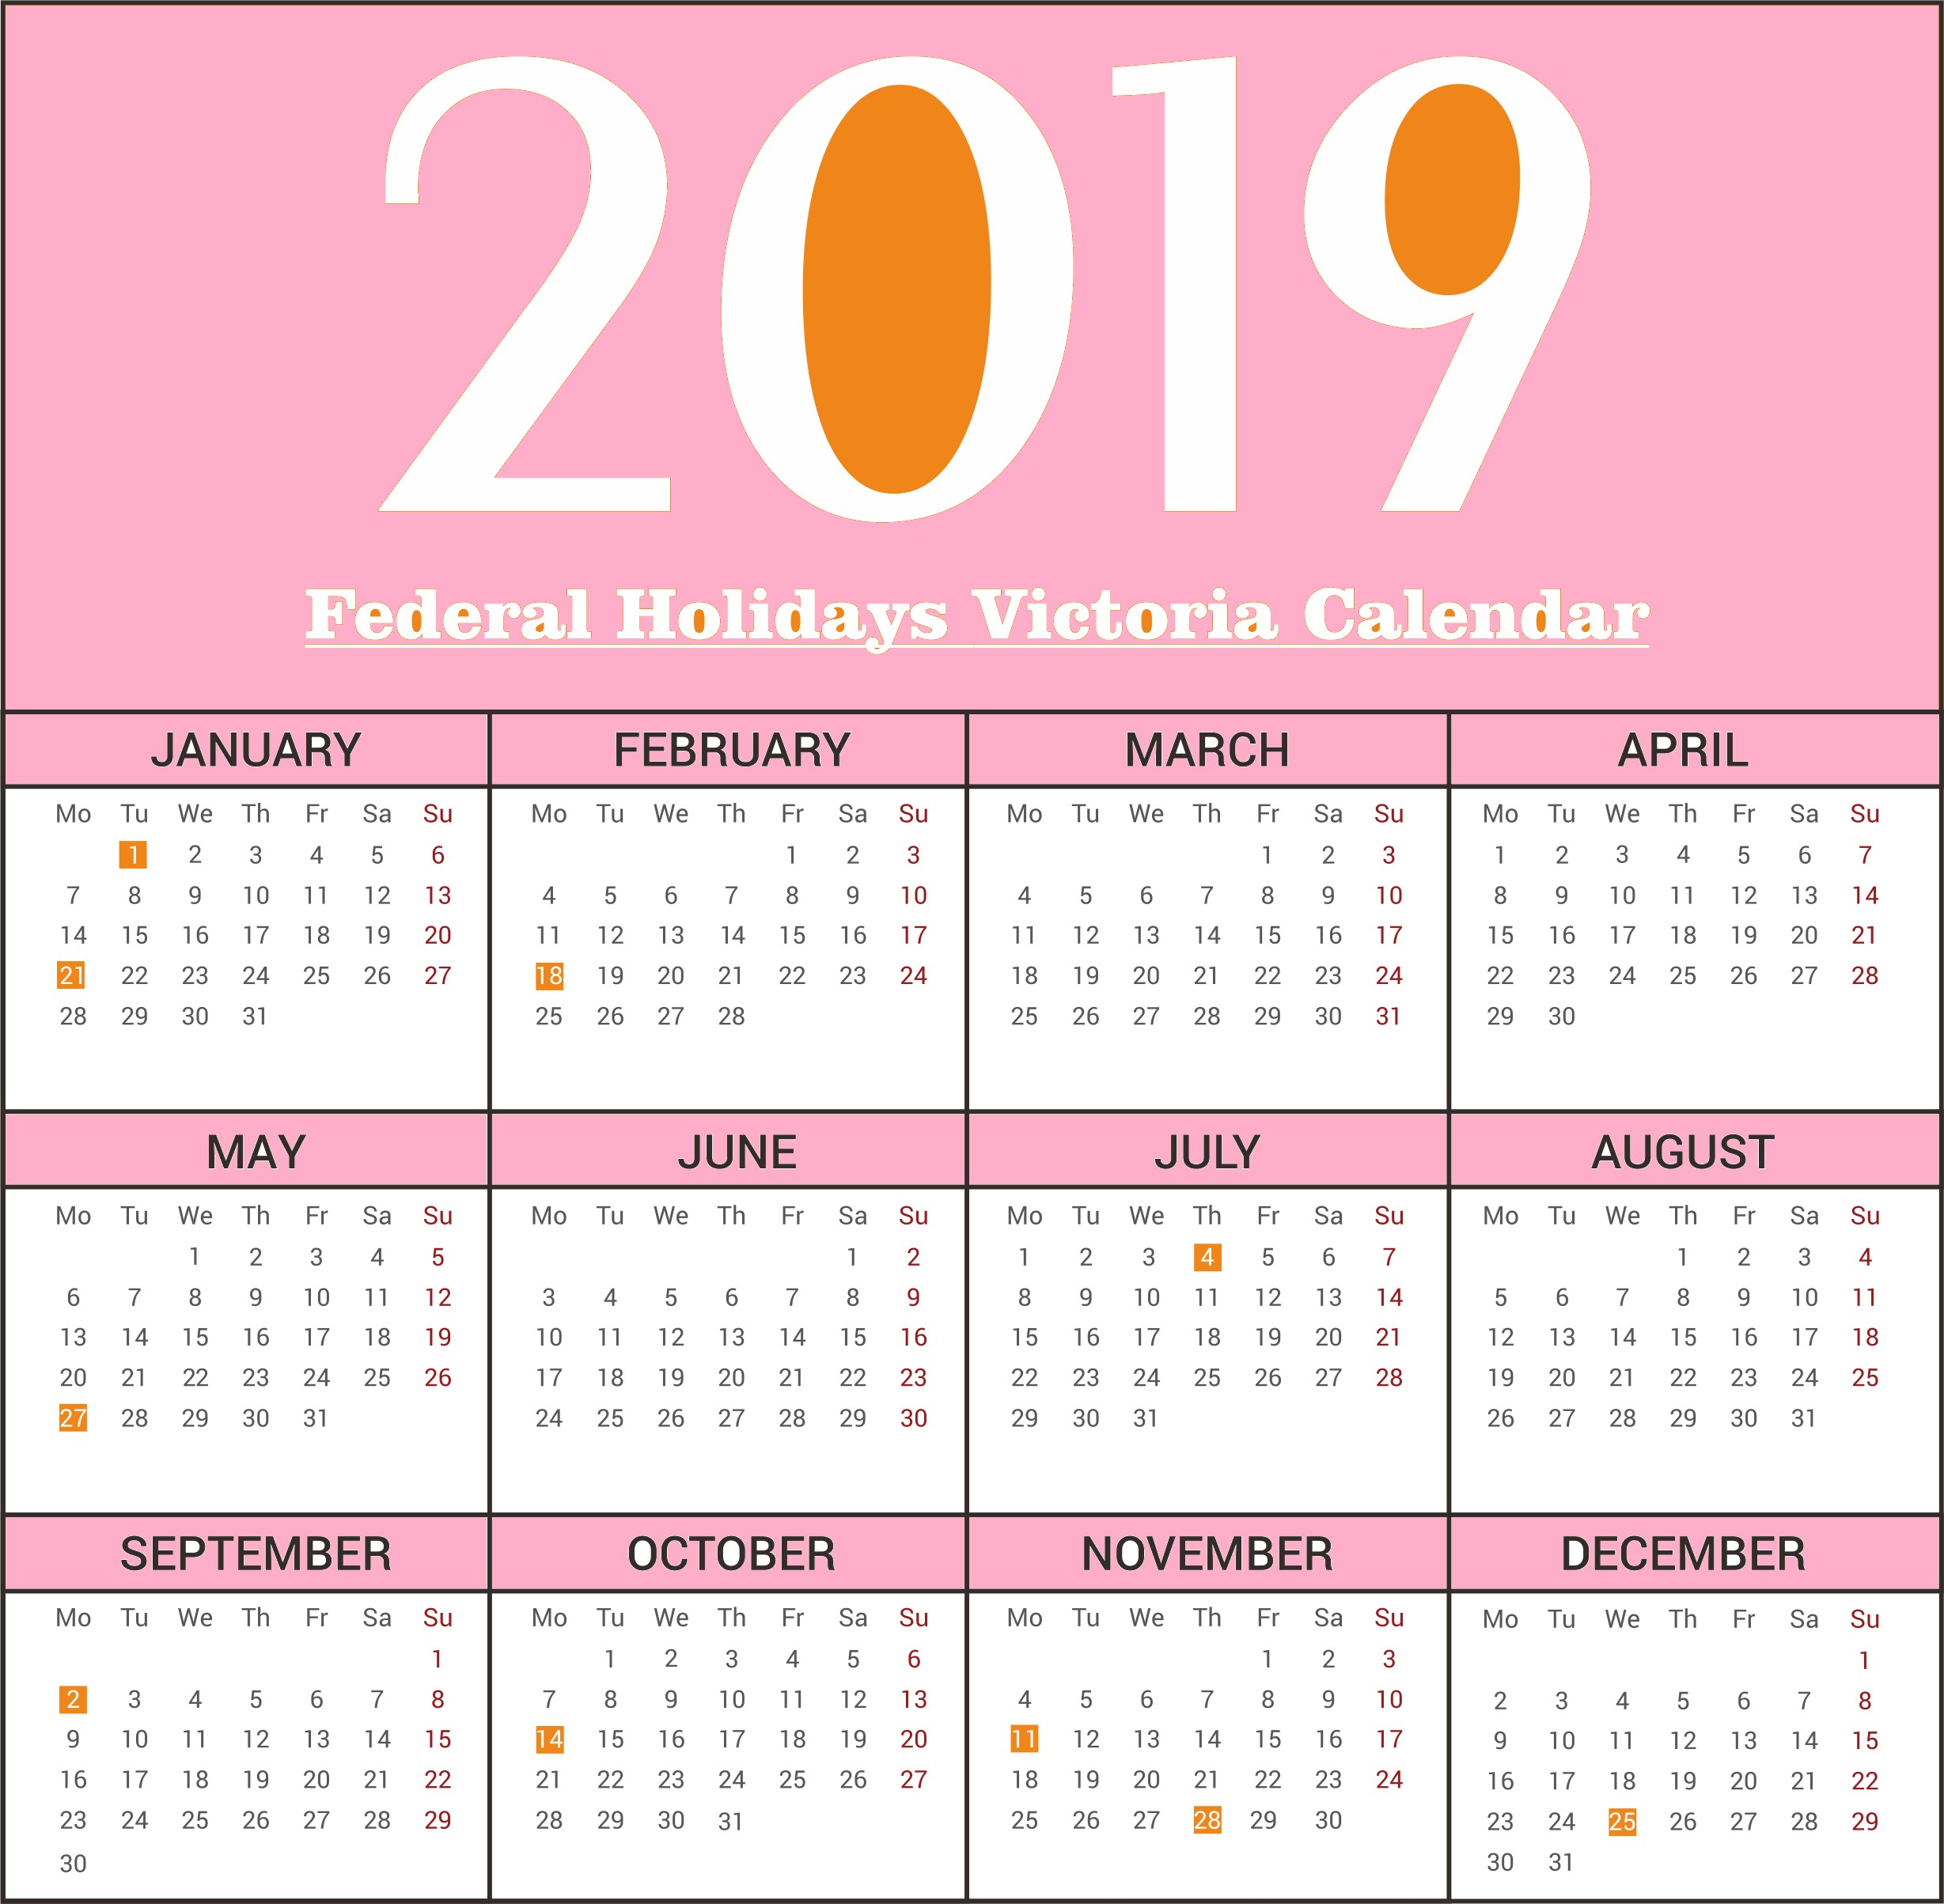 2019 Australian Calendar In Excel Más Caliente 2019 Calendar Victoria Printable Of 2019 Australian Calendar In Excel Más Recientemente Liberado Excel Calendar Template 2018 Glendale Munity Document Template